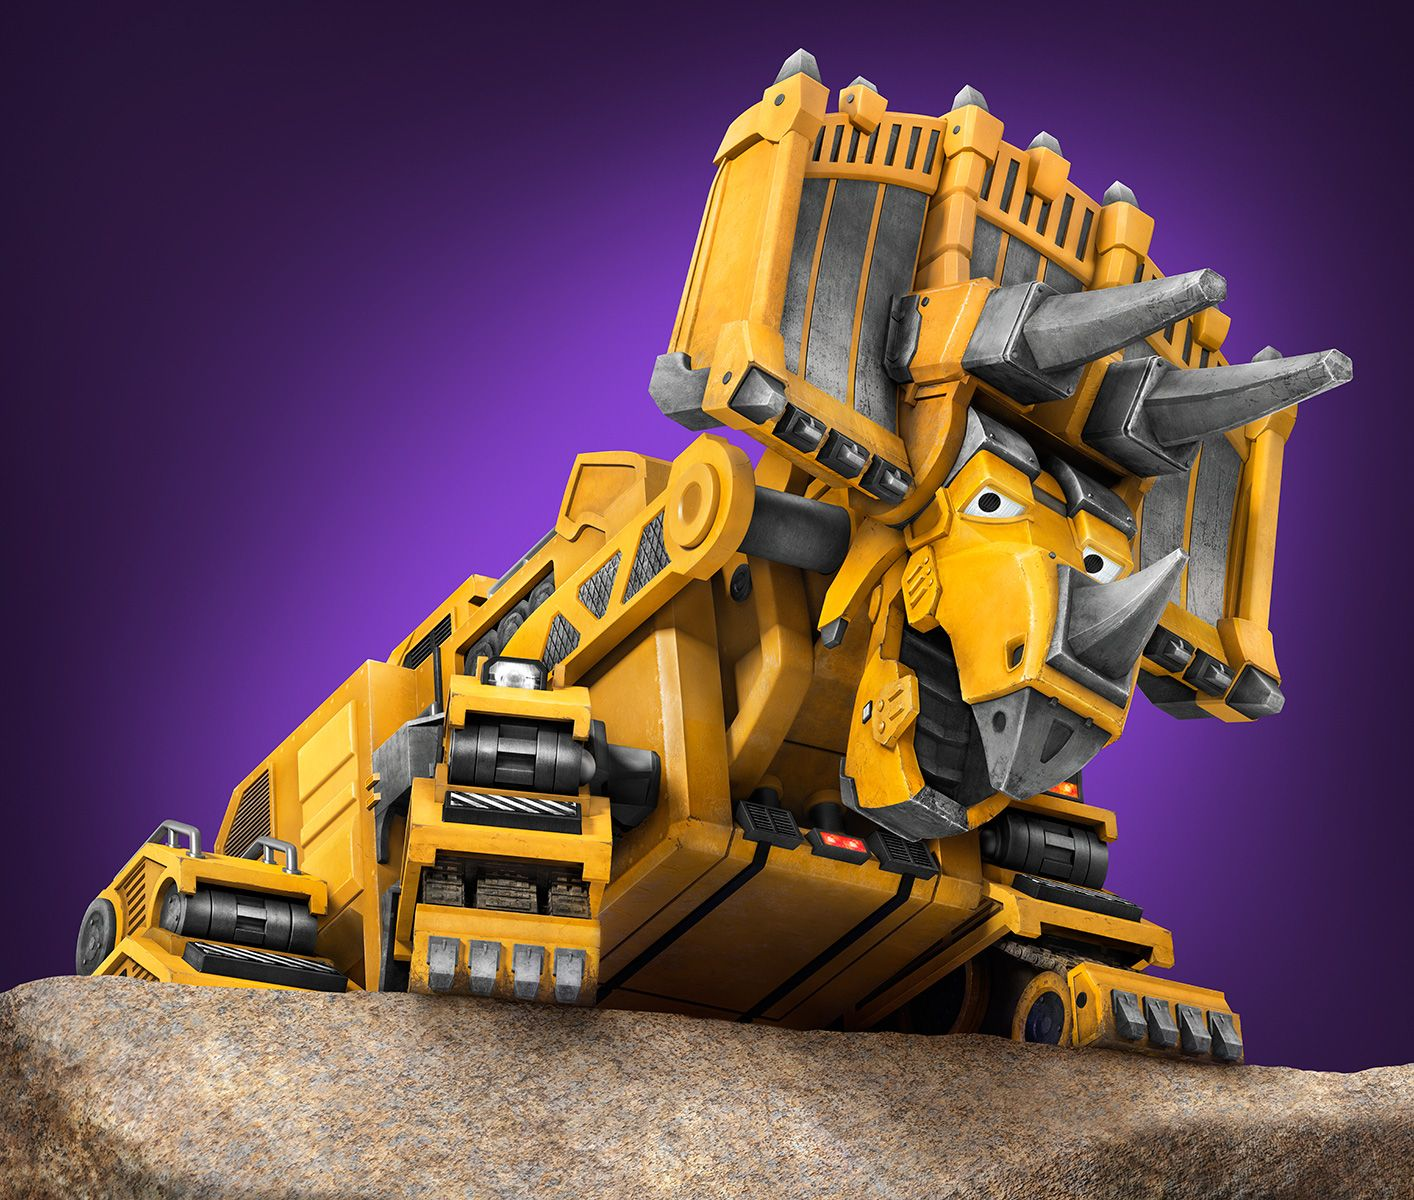 Dinotrux Character Pose Ten30 Studios Stills